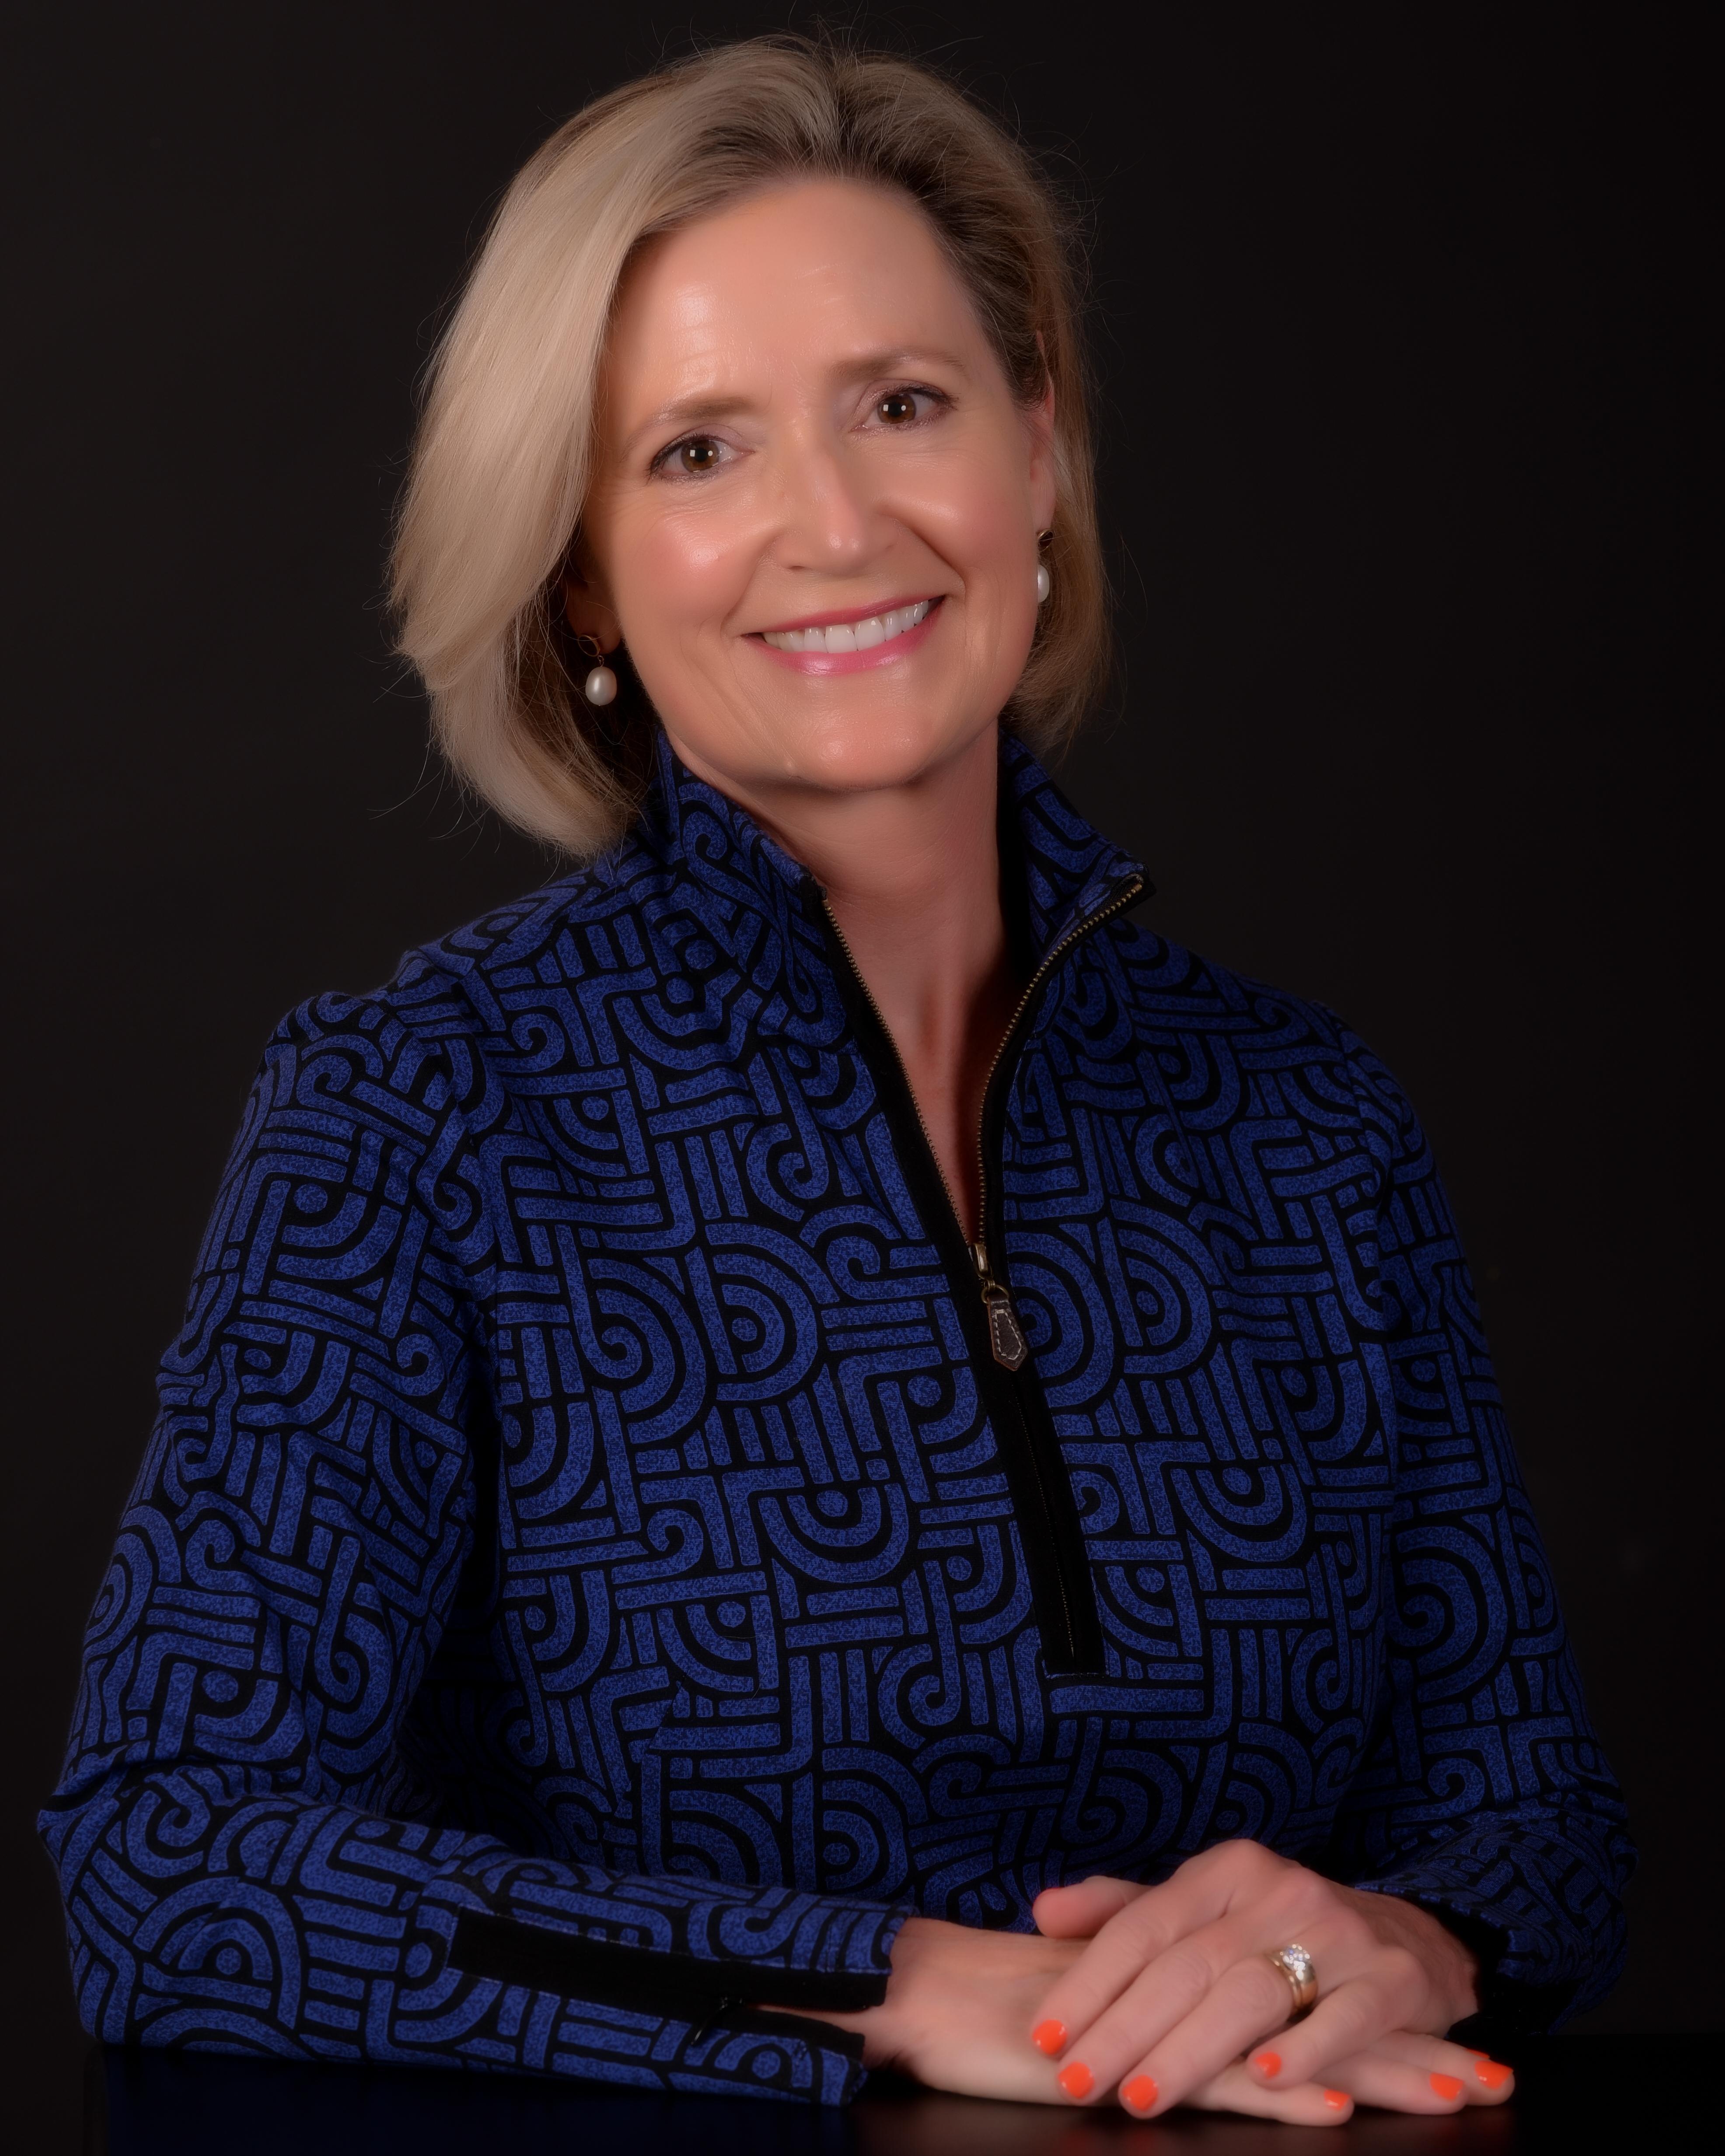 Cindy Smet